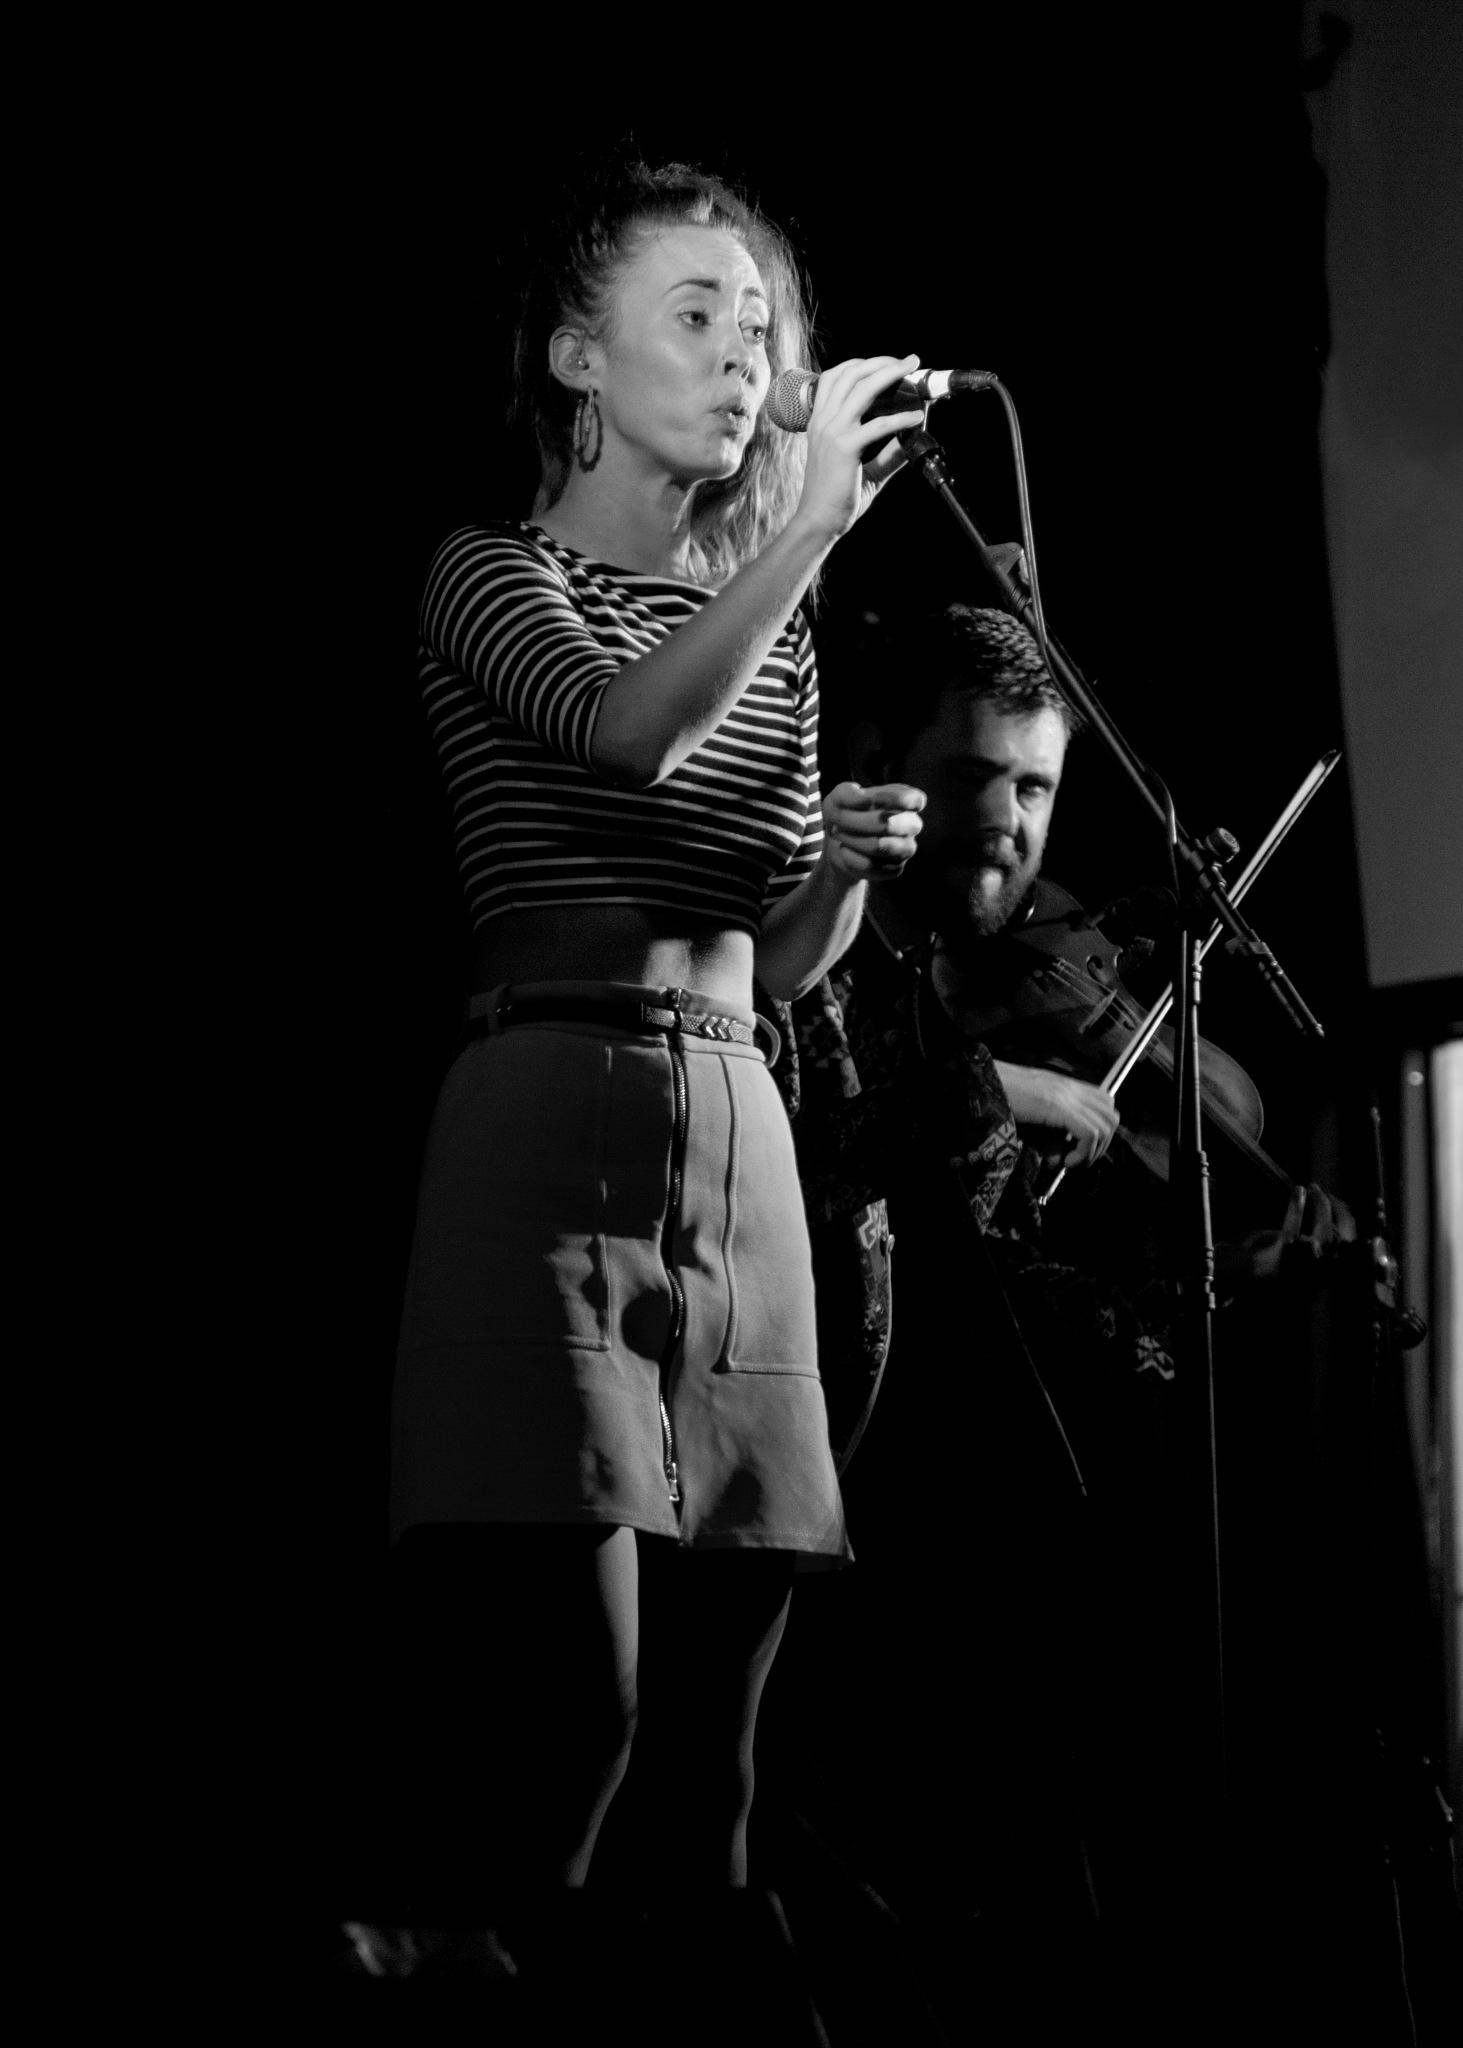 Bethan Williams-Jones - Calan - Folk at the Hall - Monochrome by paul.hosker